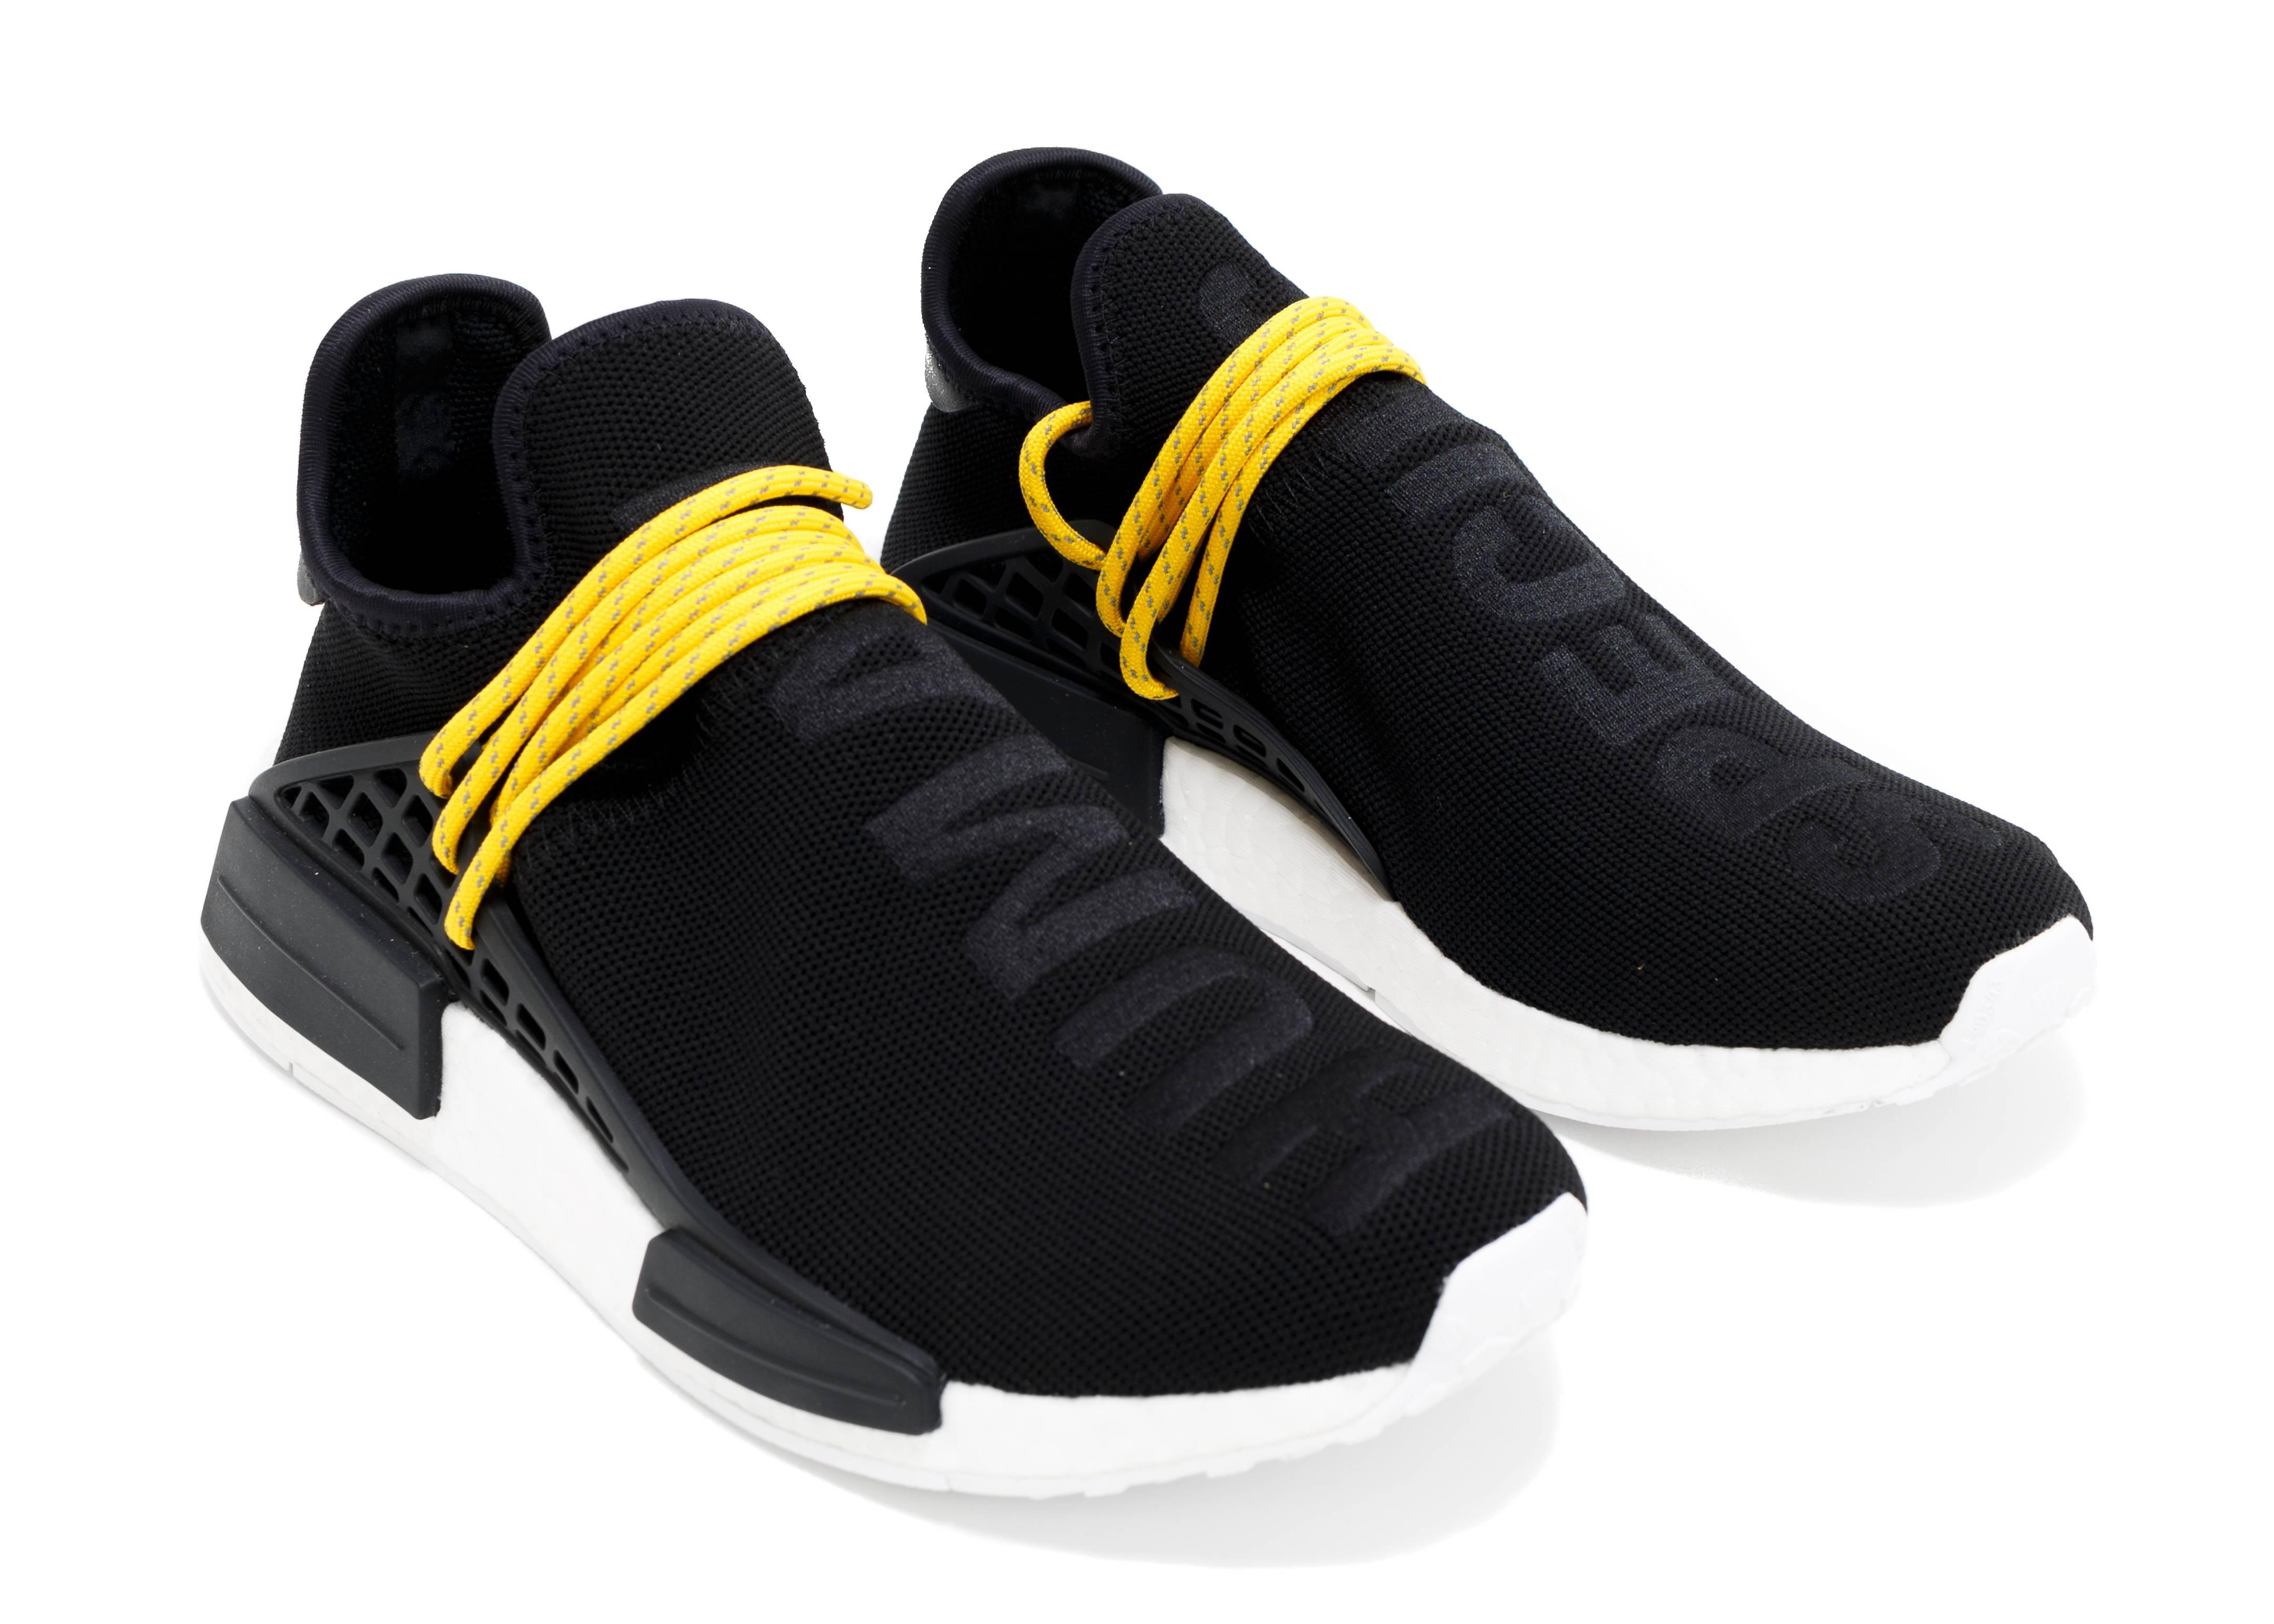 Pw Human Race Nmd Quotpharrellquot Adidas Bb3068 Cblack